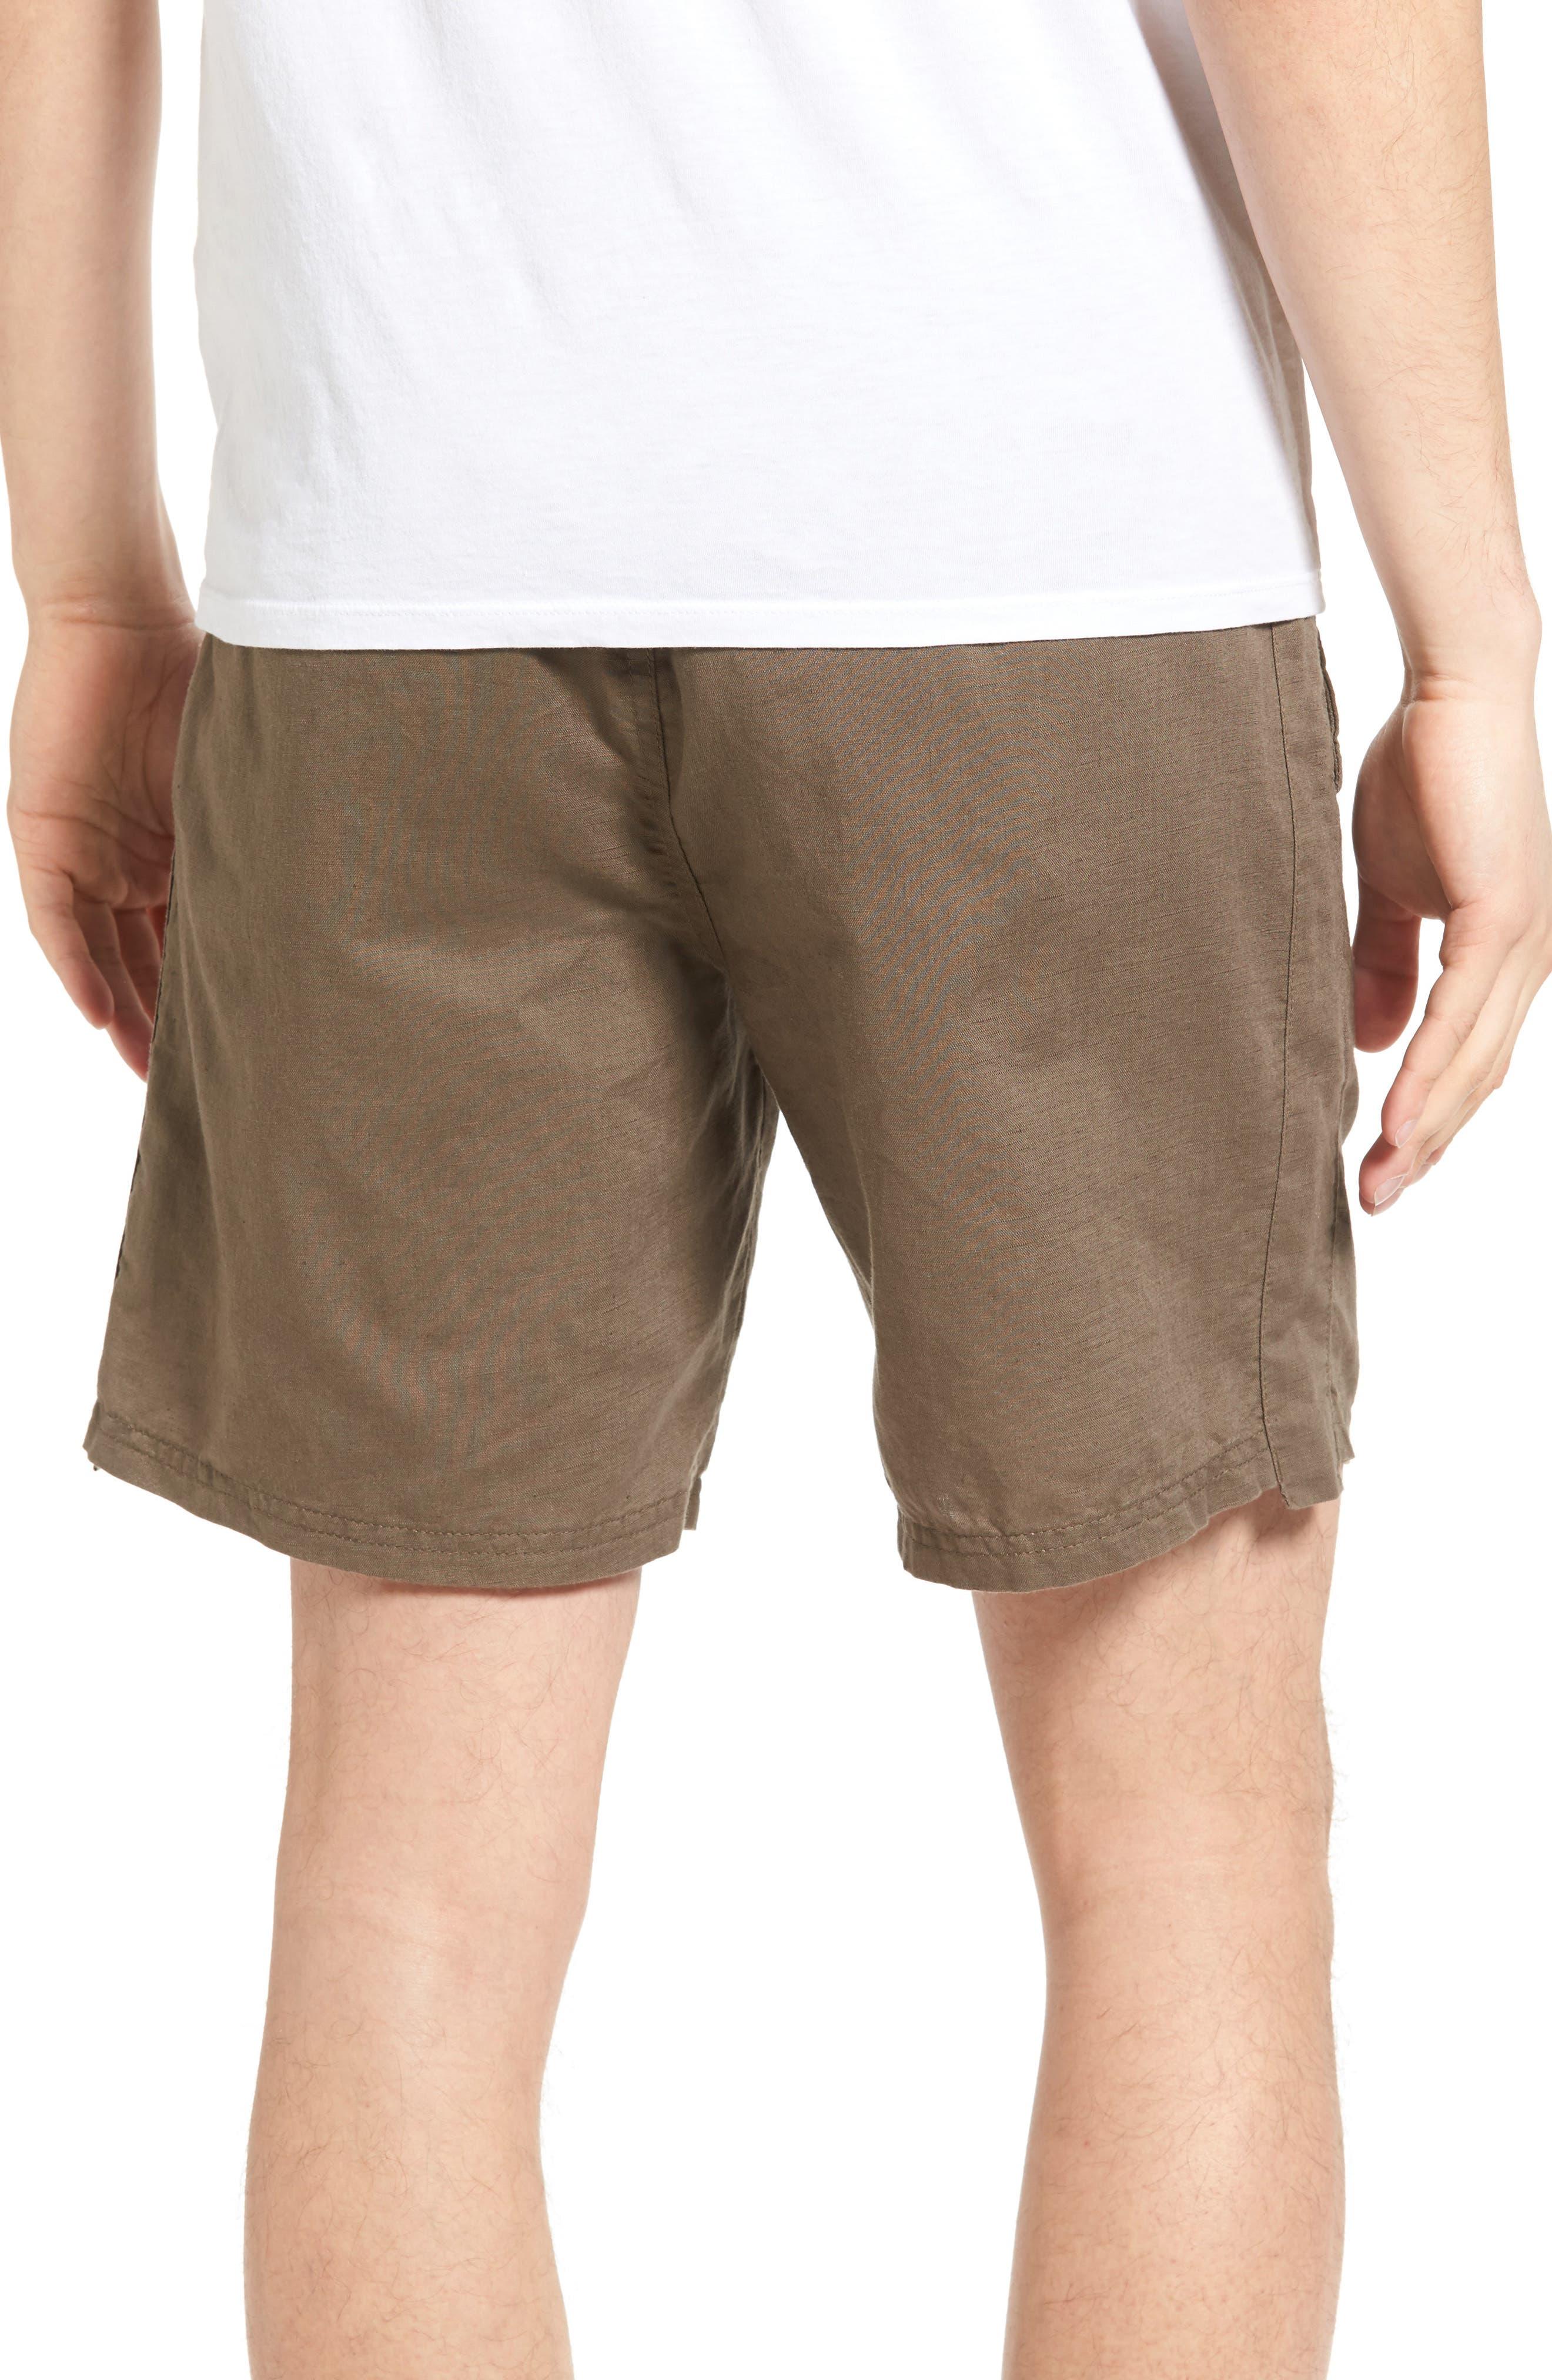 Omni Linen Blend Shorts,                             Alternate thumbnail 2, color,                             310